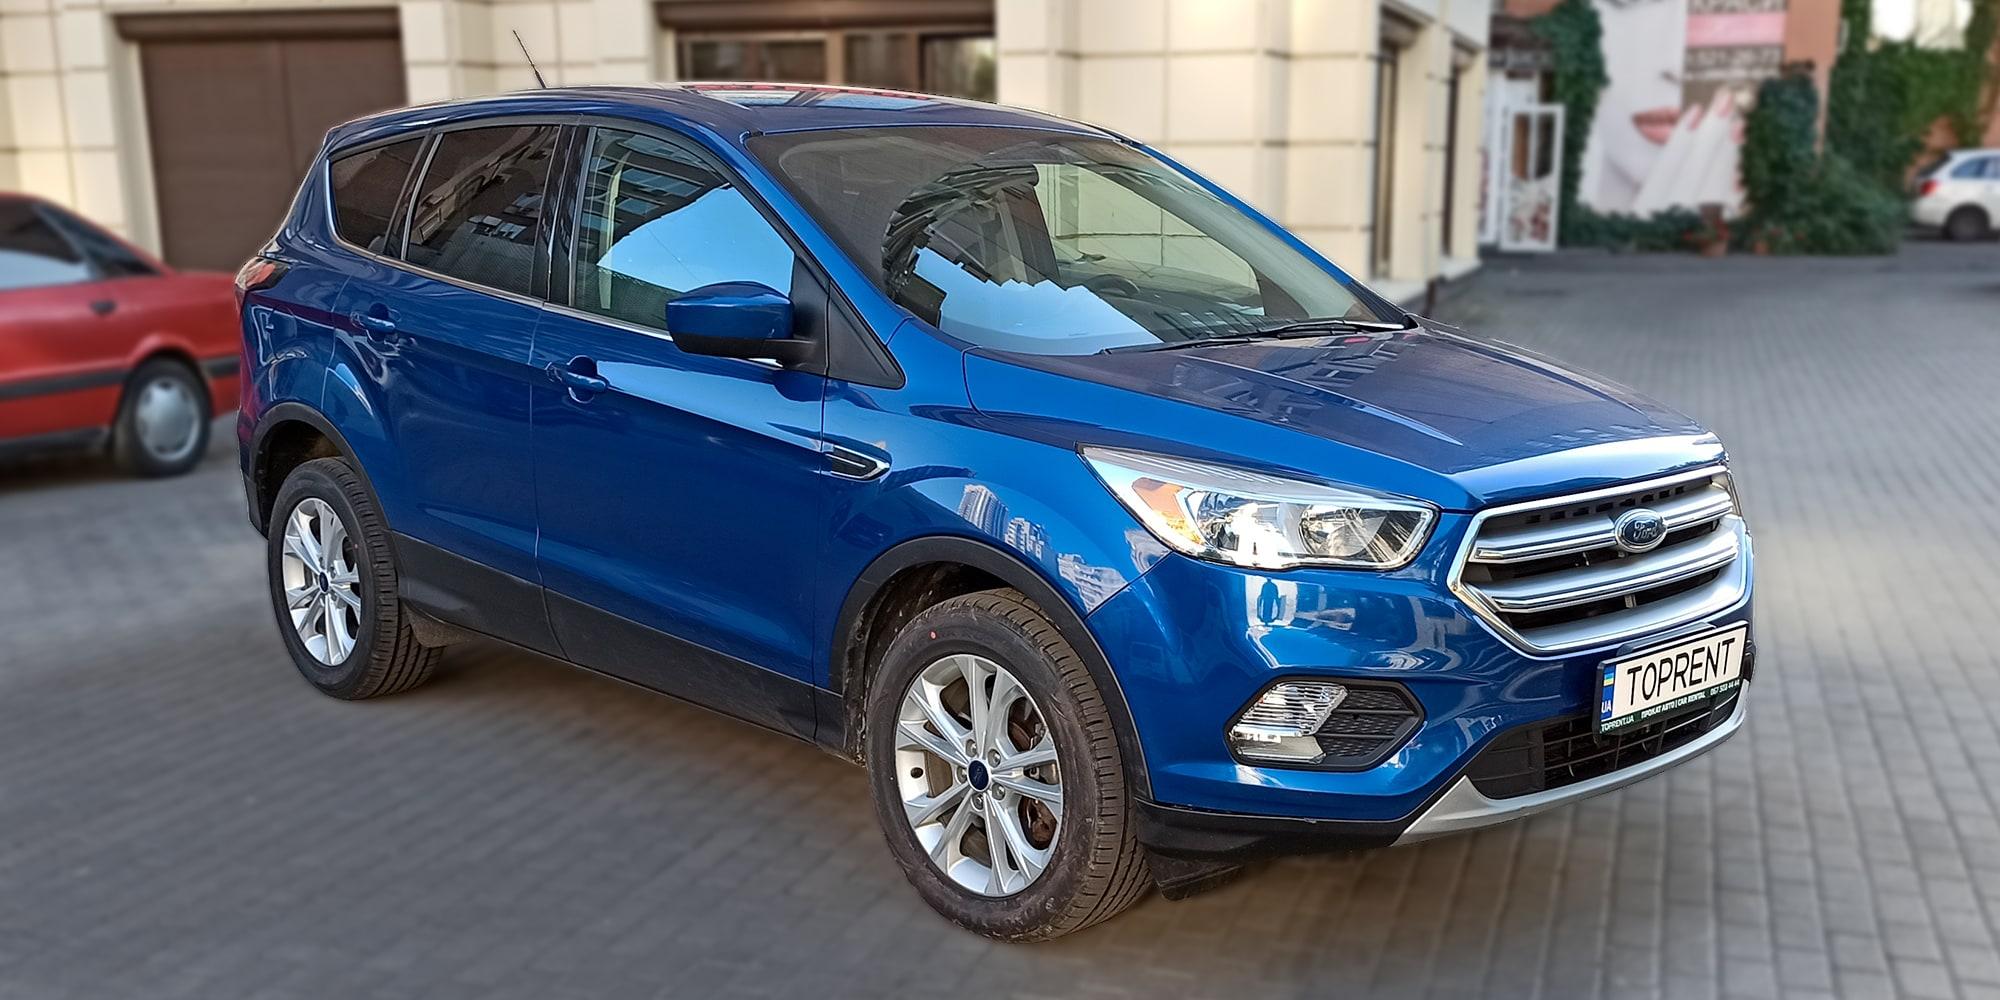 Ford-Escape-2017-TopRent.UA-1